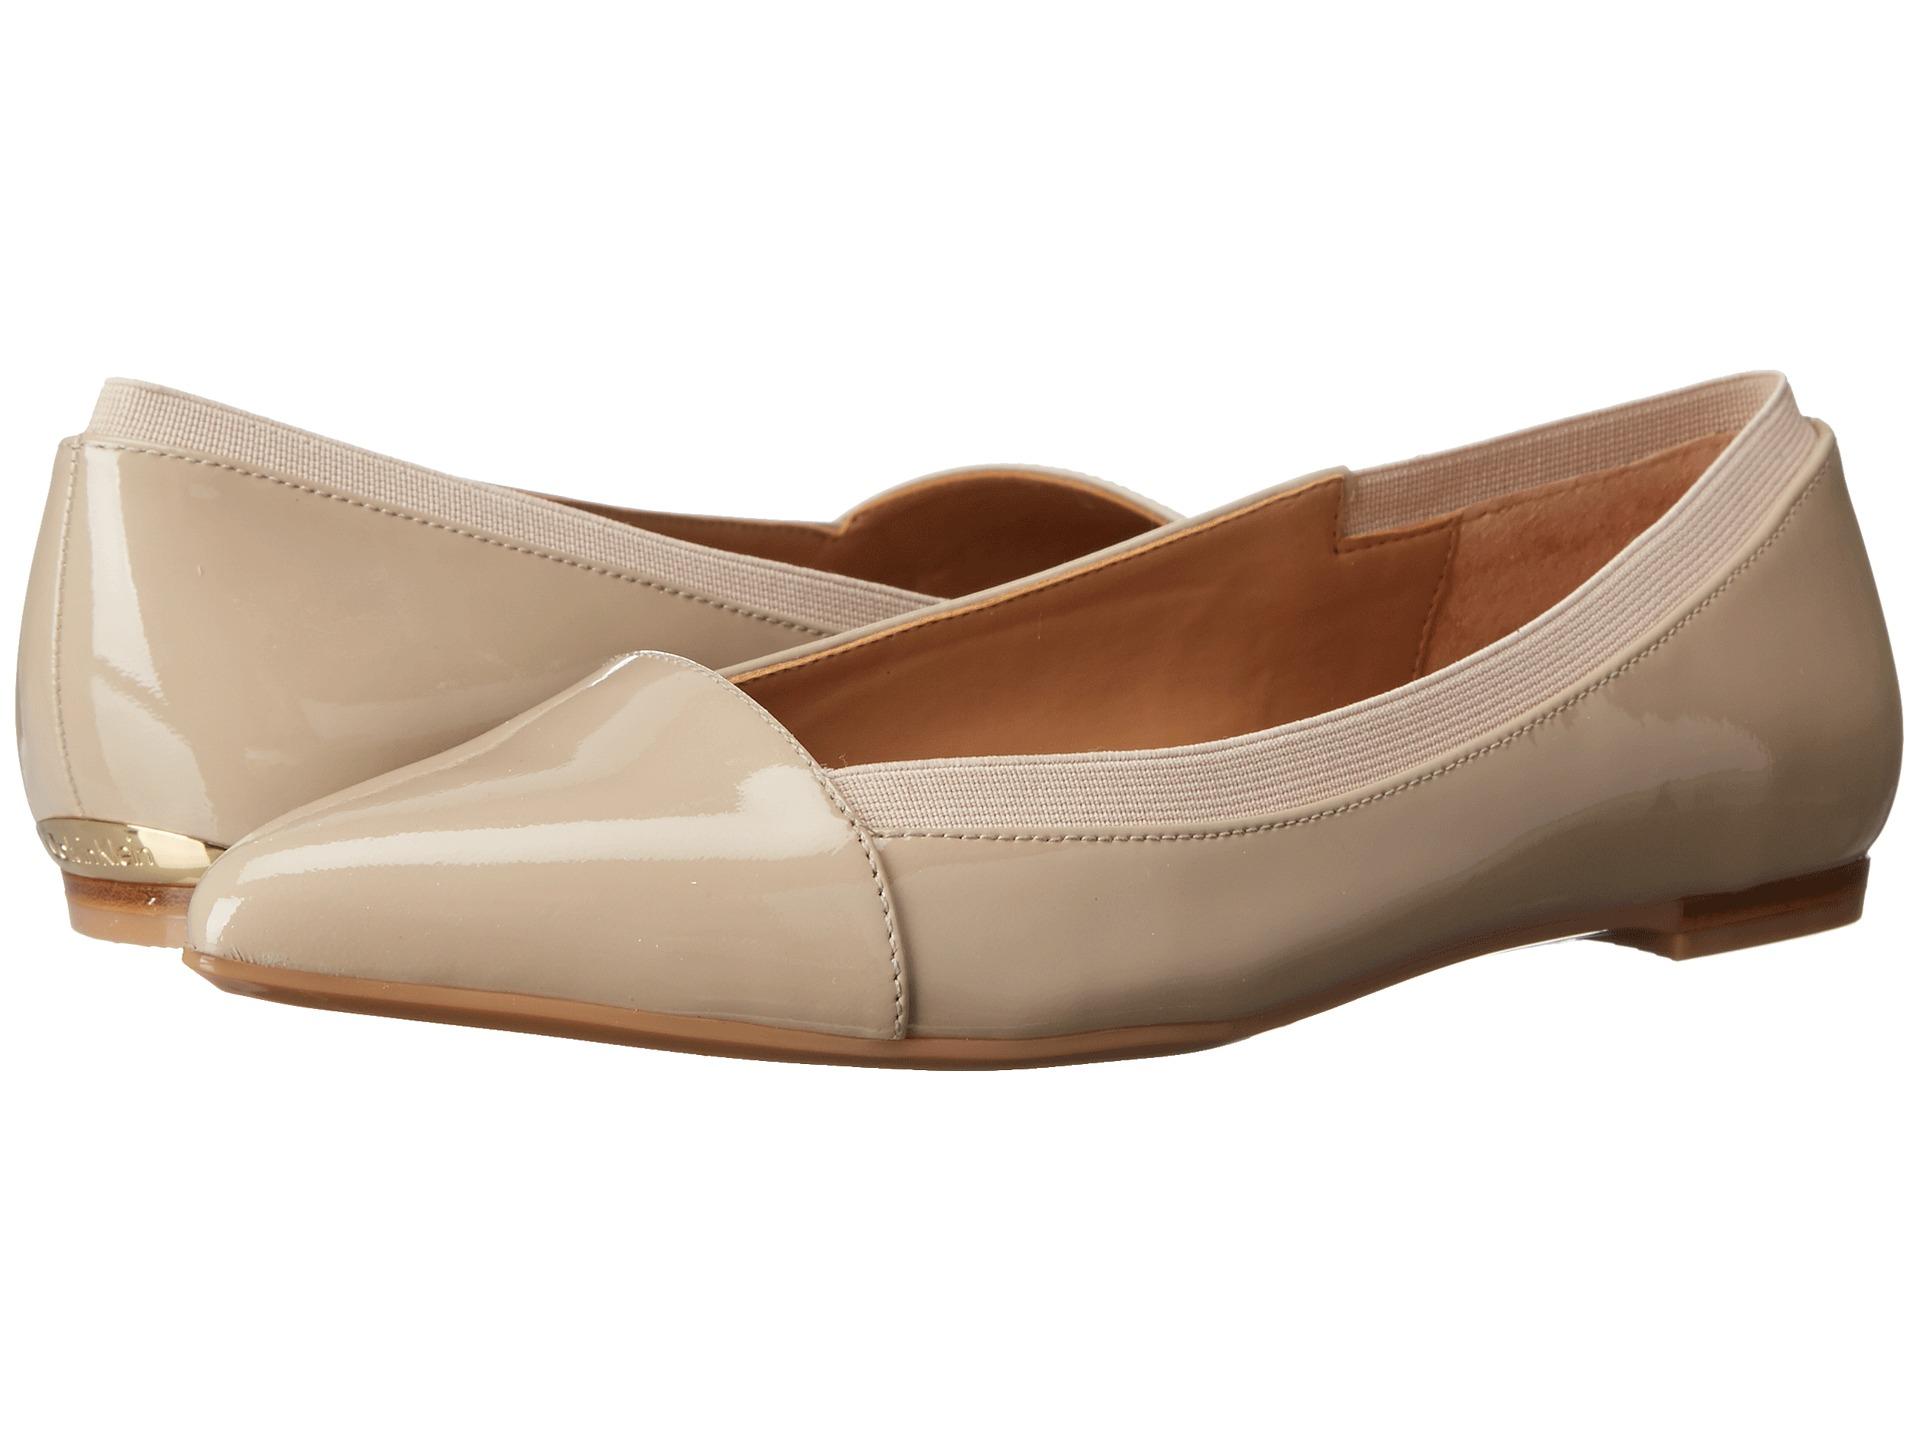 Womens Shoes Calvin Klein Gerarda Cocoon Patent